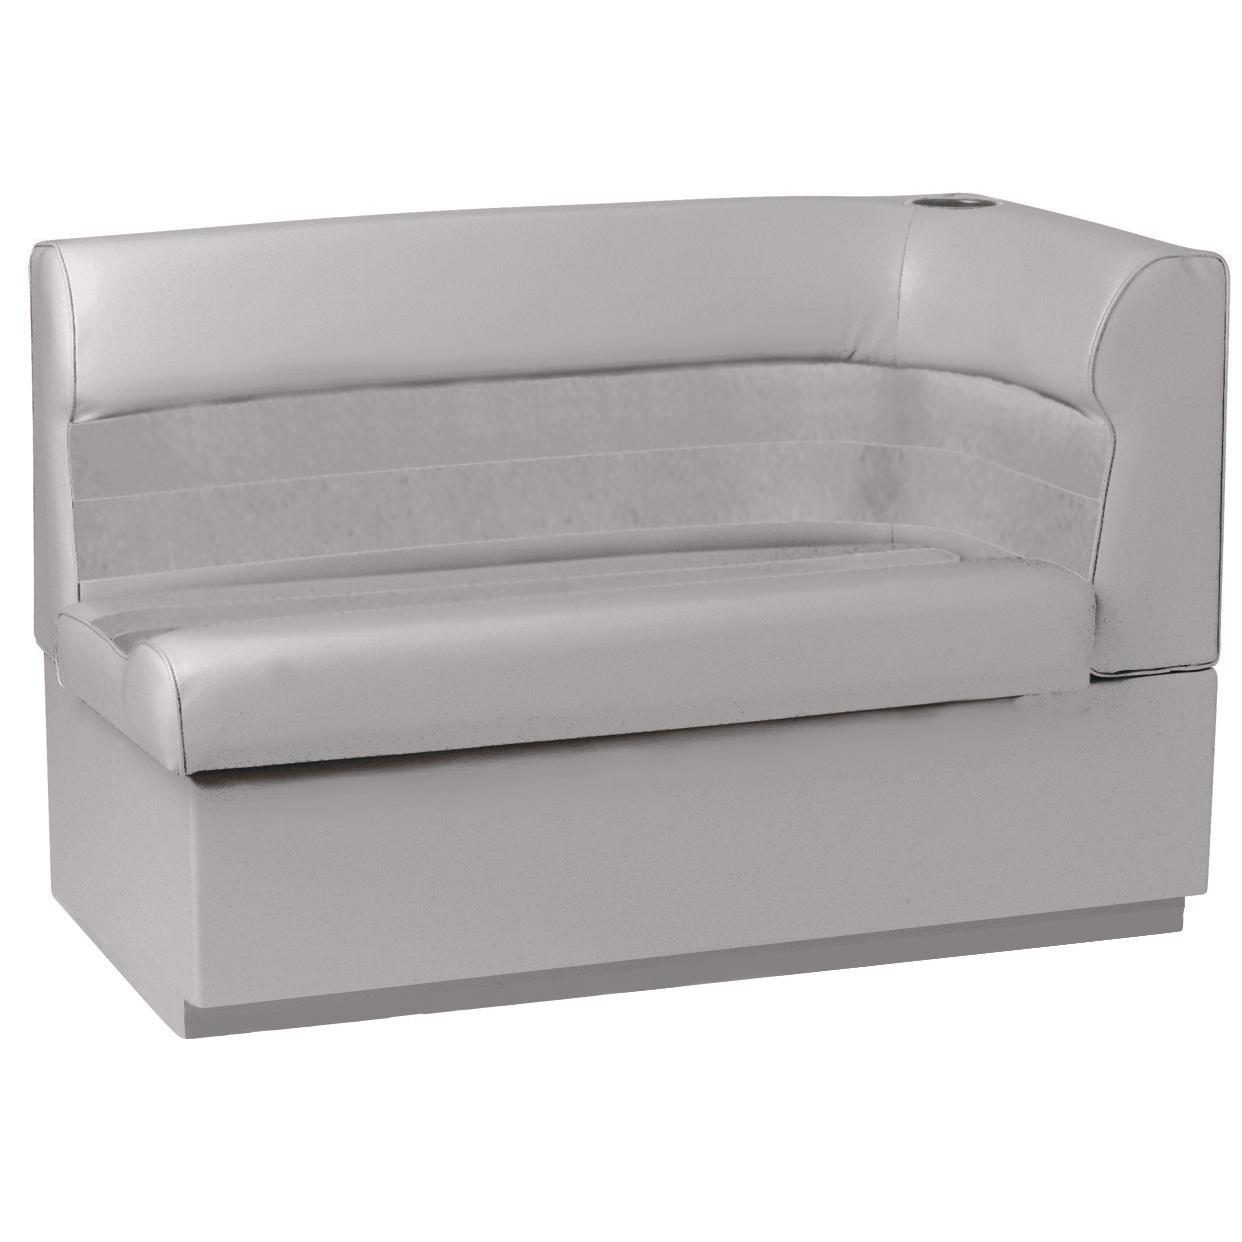 Astounding Bm Deluxe Pontoon Corner Couch Left Creativecarmelina Interior Chair Design Creativecarmelinacom